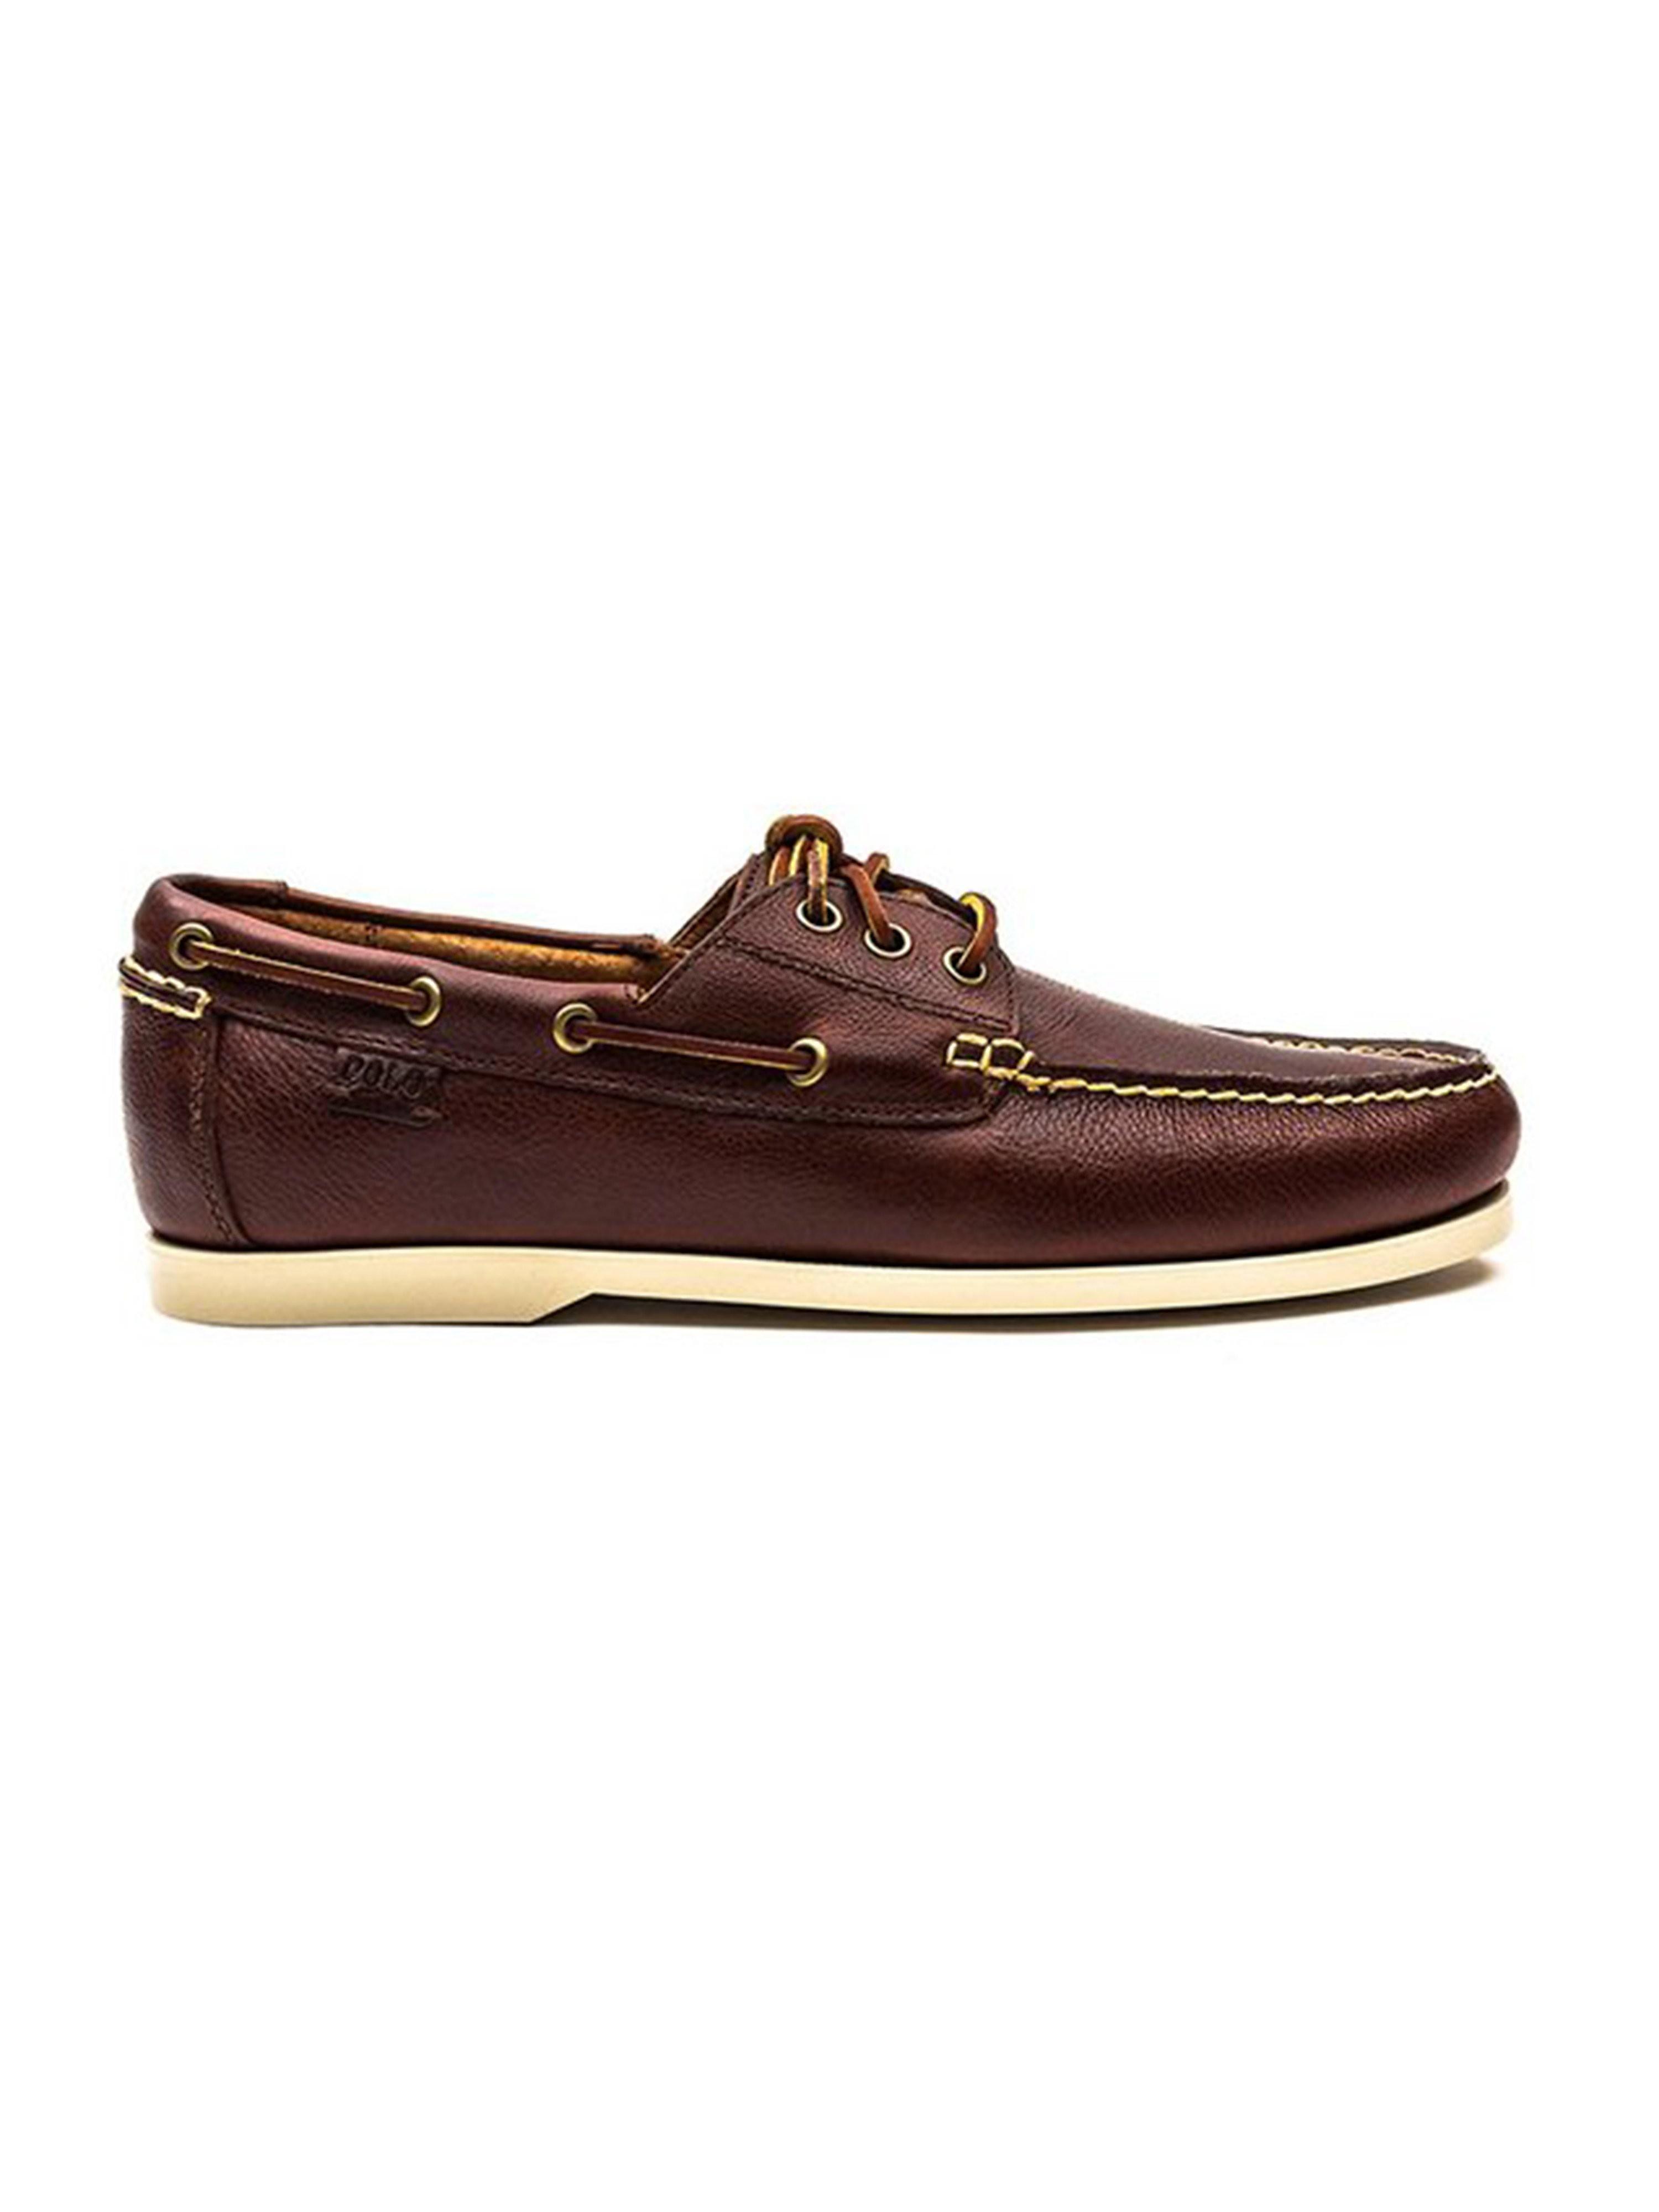 Polo  Leather Mens Boat Shoe - Tan